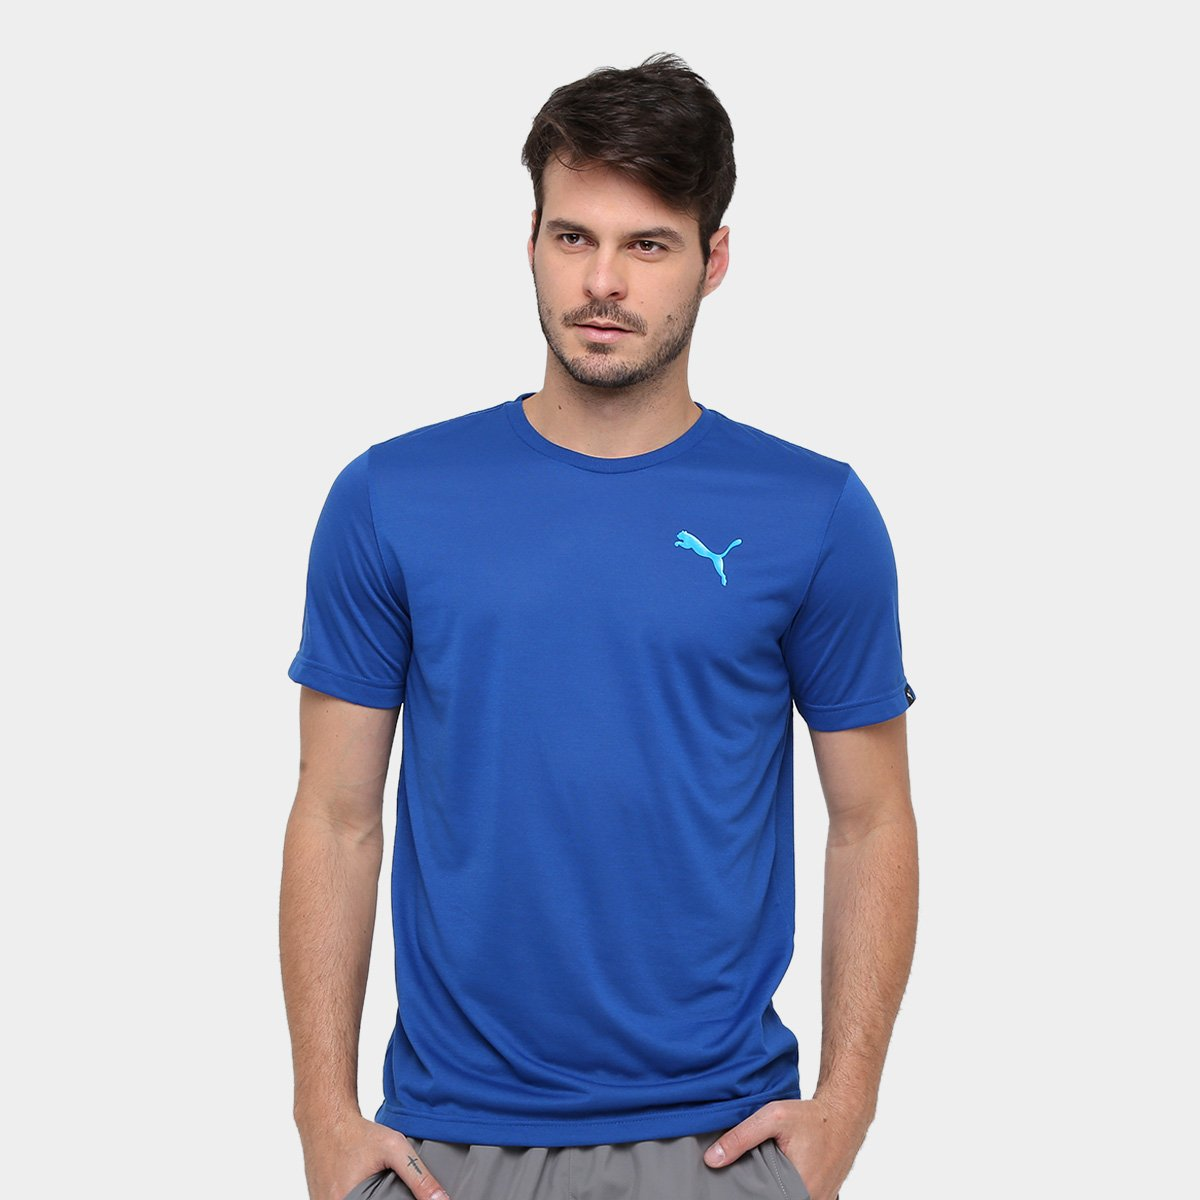 a75c9364b3 Camiseta Puma Active Masculina - Compre Agora